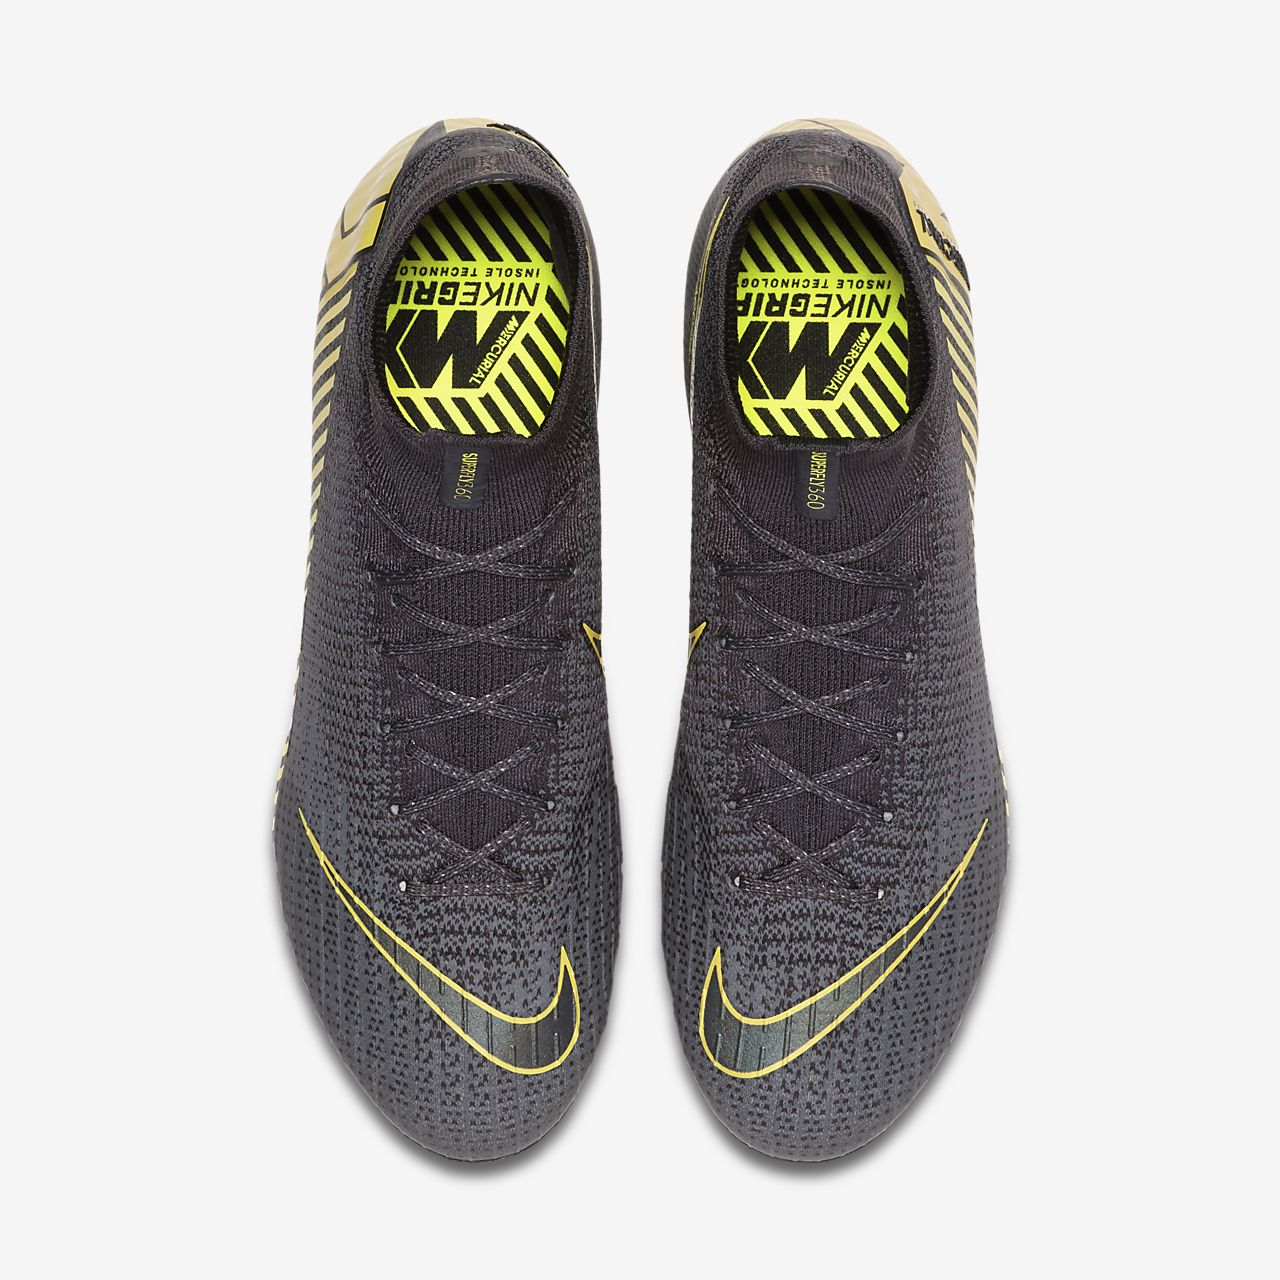 Pour De Terrain Gras Nike Football Mercurial Crampons À Chaussure OkTPuiXZ